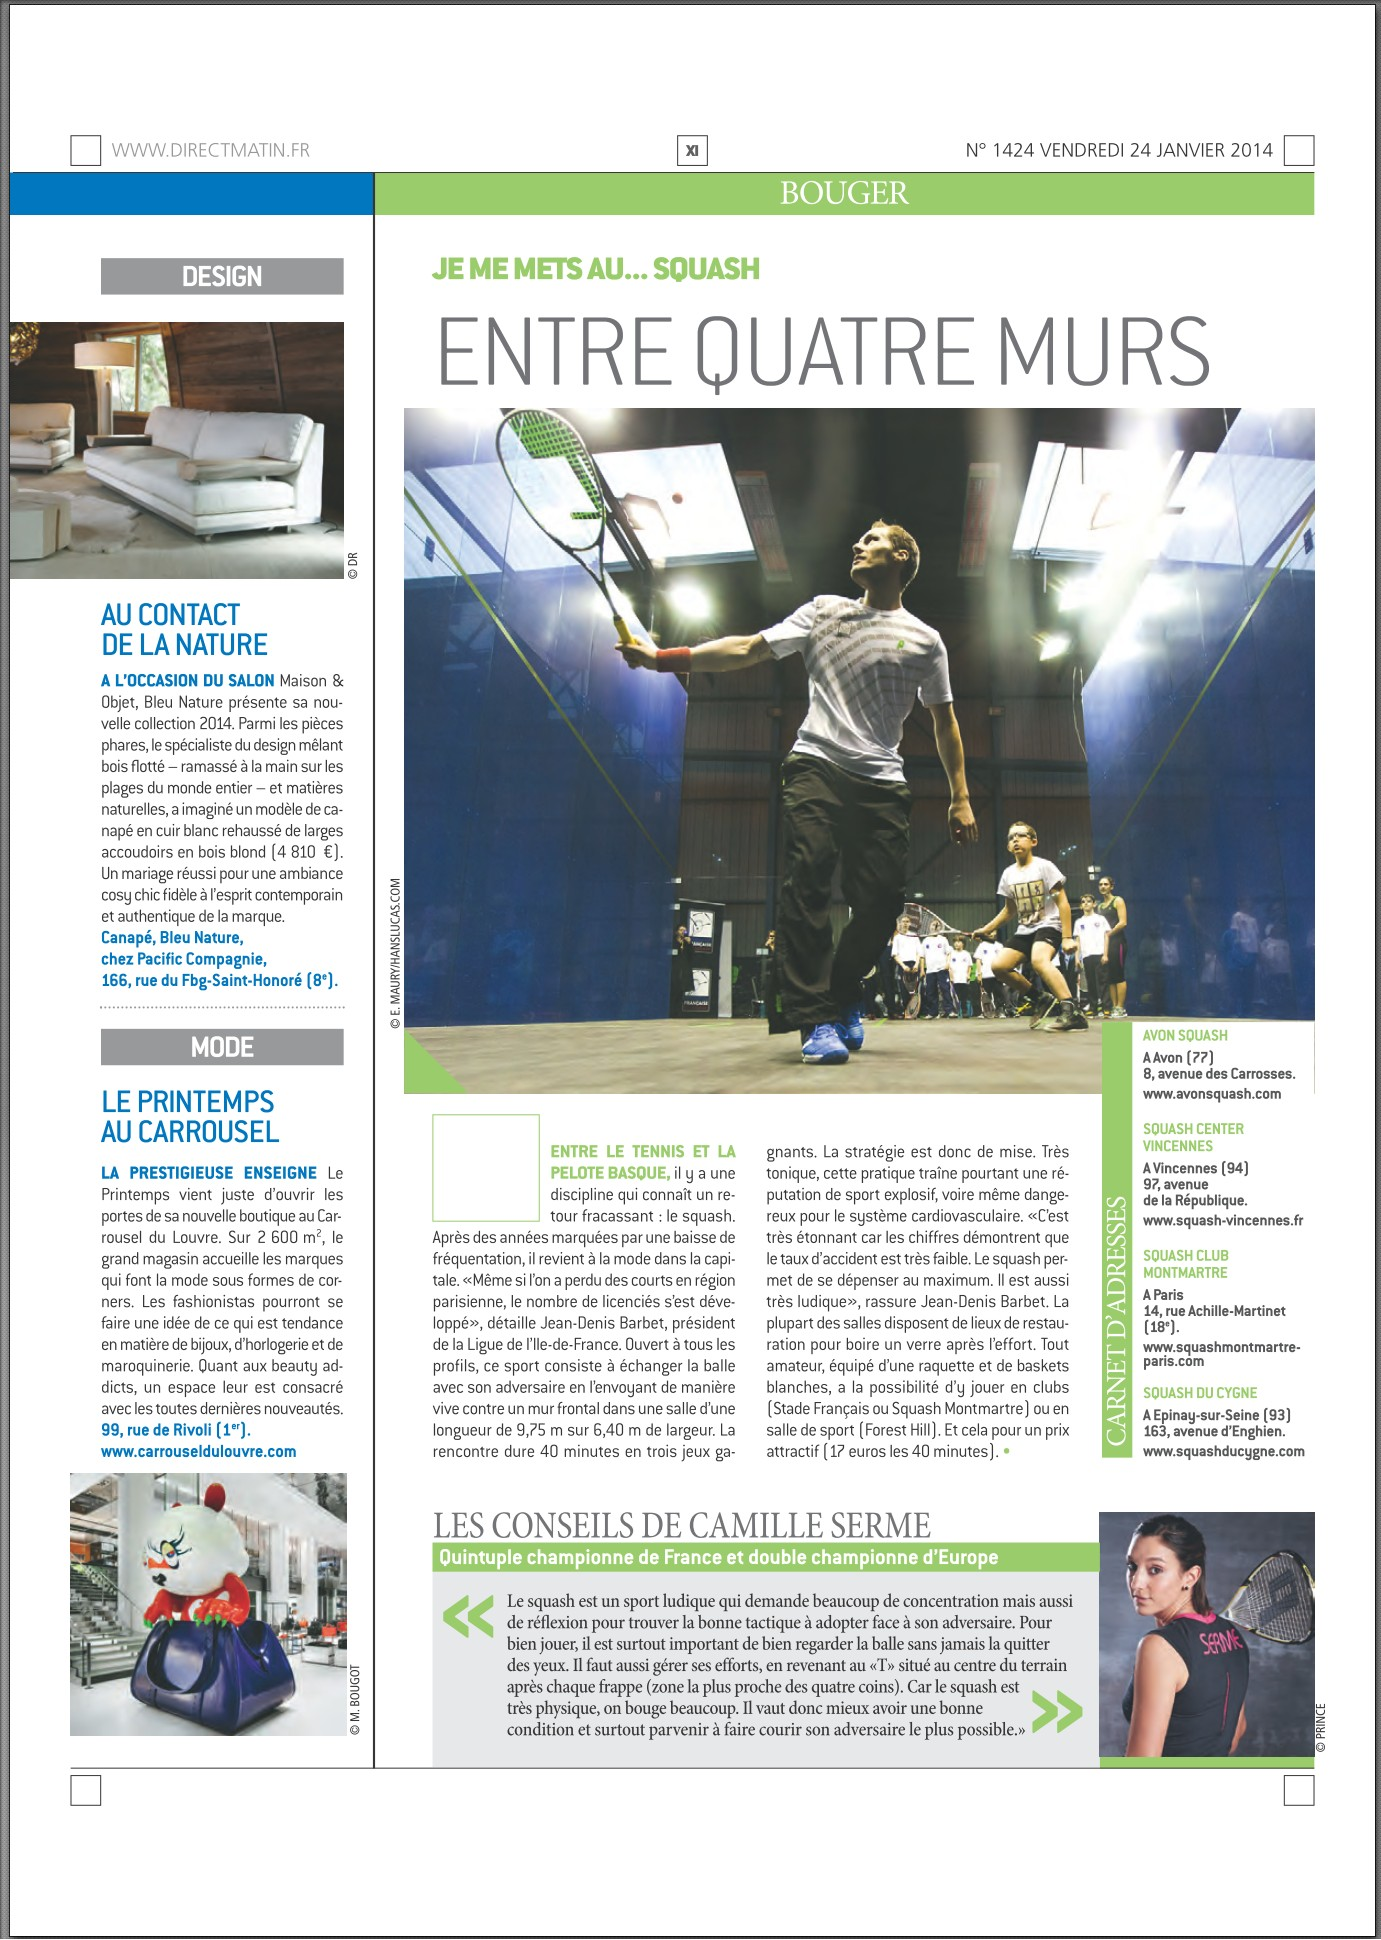 http://www.liguebretagnesquash.fr/pdf/coinpresse/51.jpg